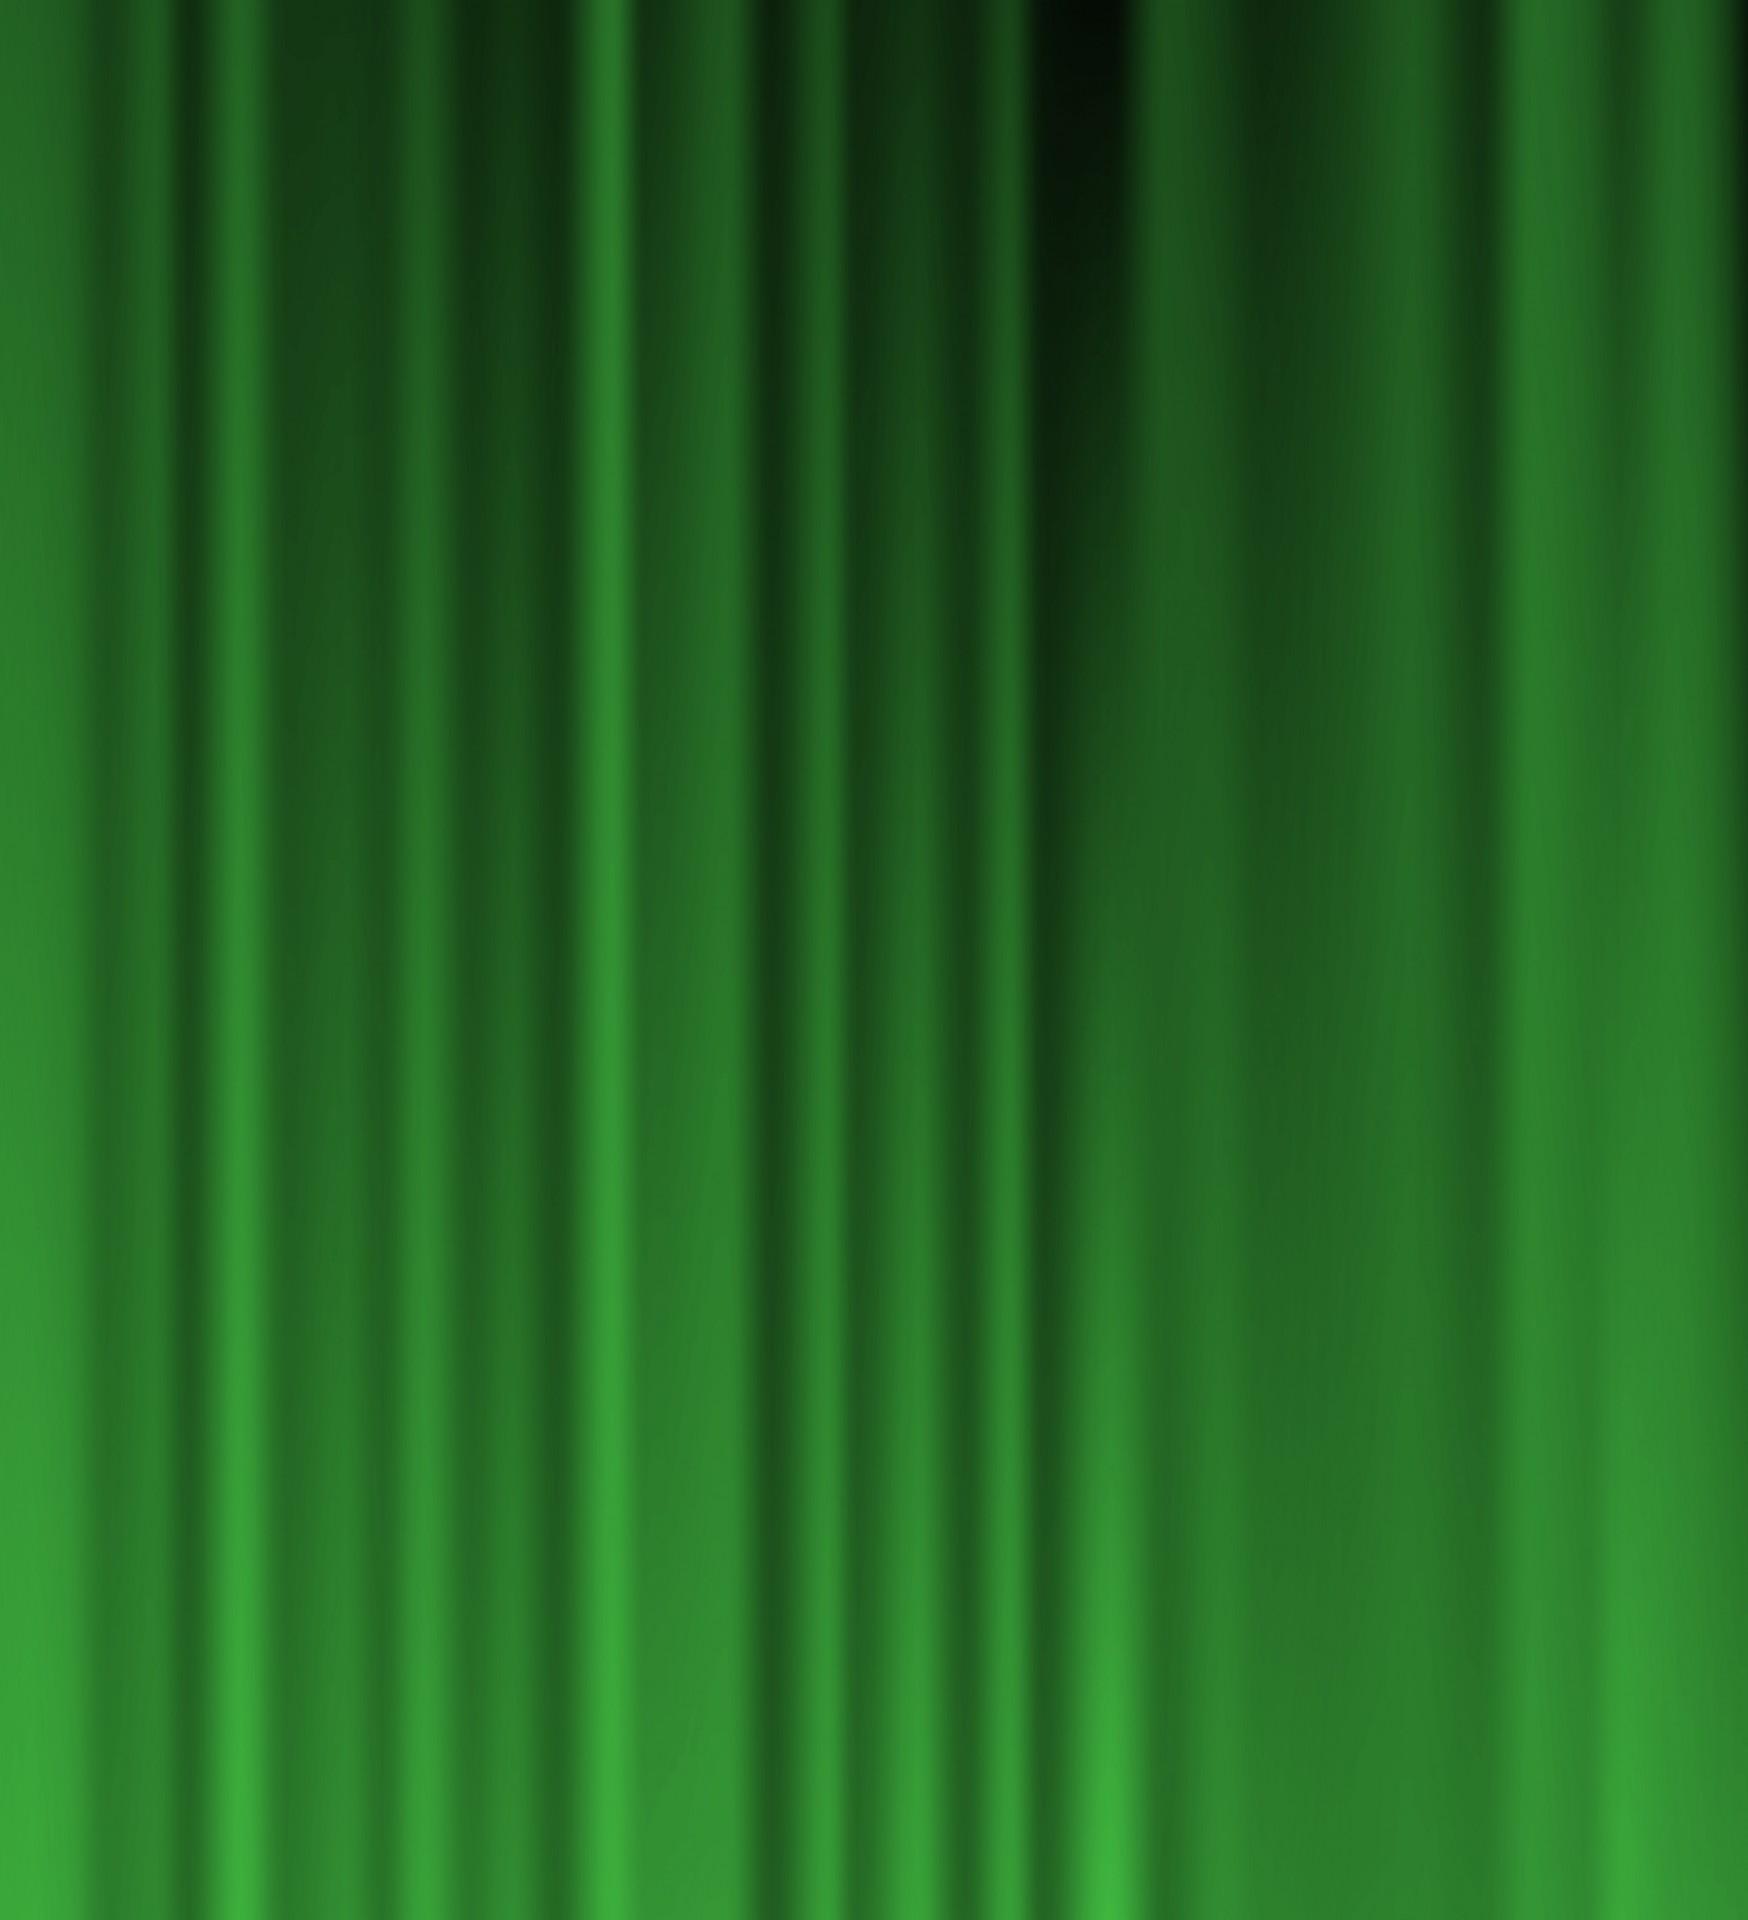 Curtains Curtain Drapes Green Velvet Free Image From Needpix Com